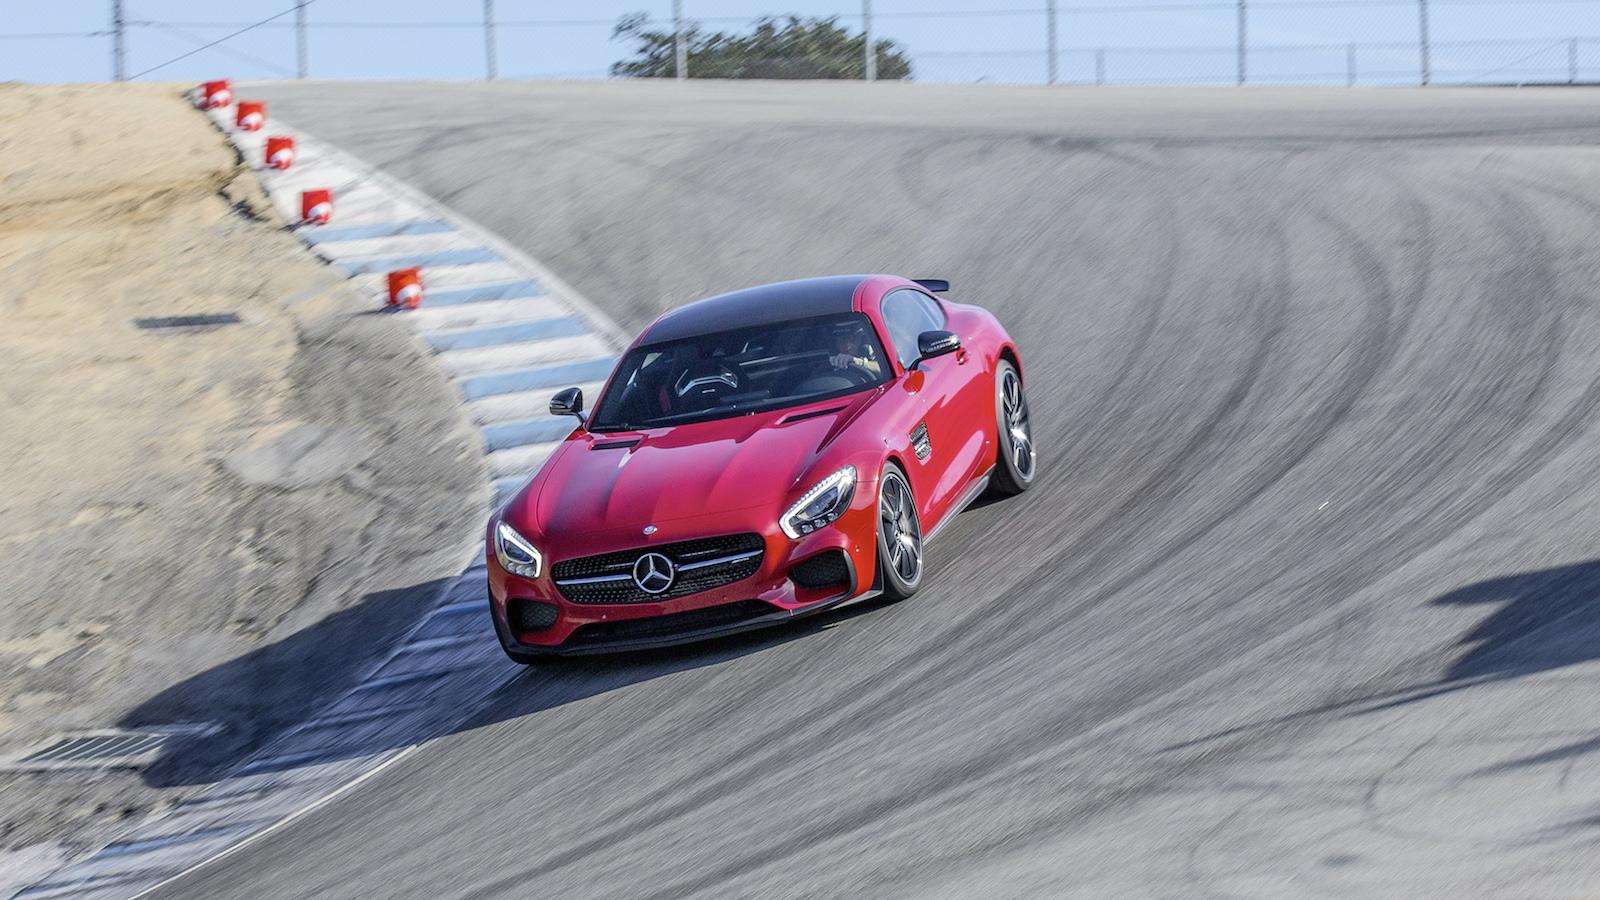 2016 Mercedes-Benz AMG GT S at Laguna Seca, first drive, November 2014